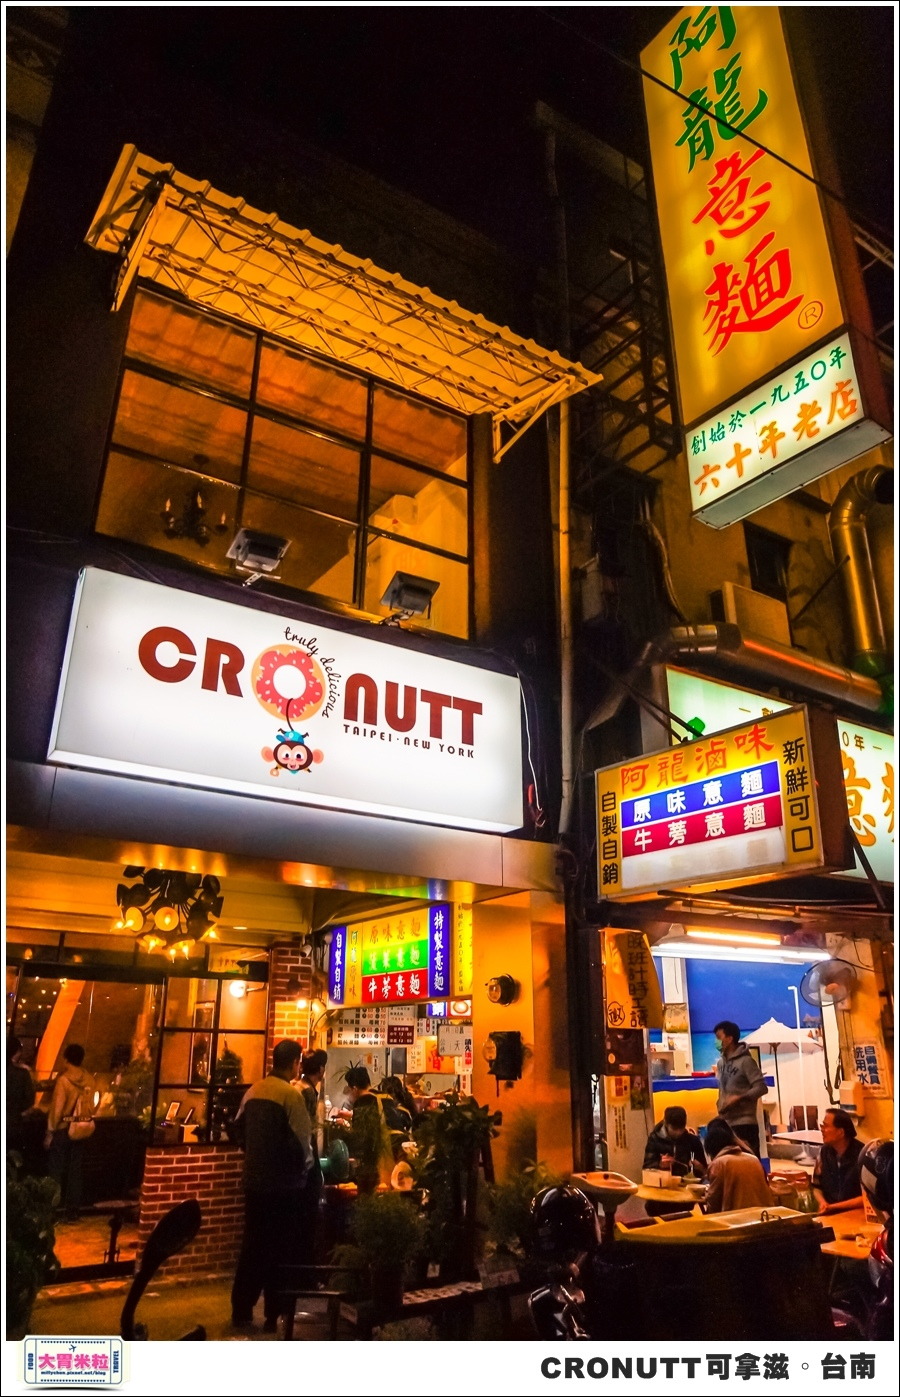 CRONUTT可拿滋台南店@紐約可頌甜甜圈@大胃米粒0047.jpg